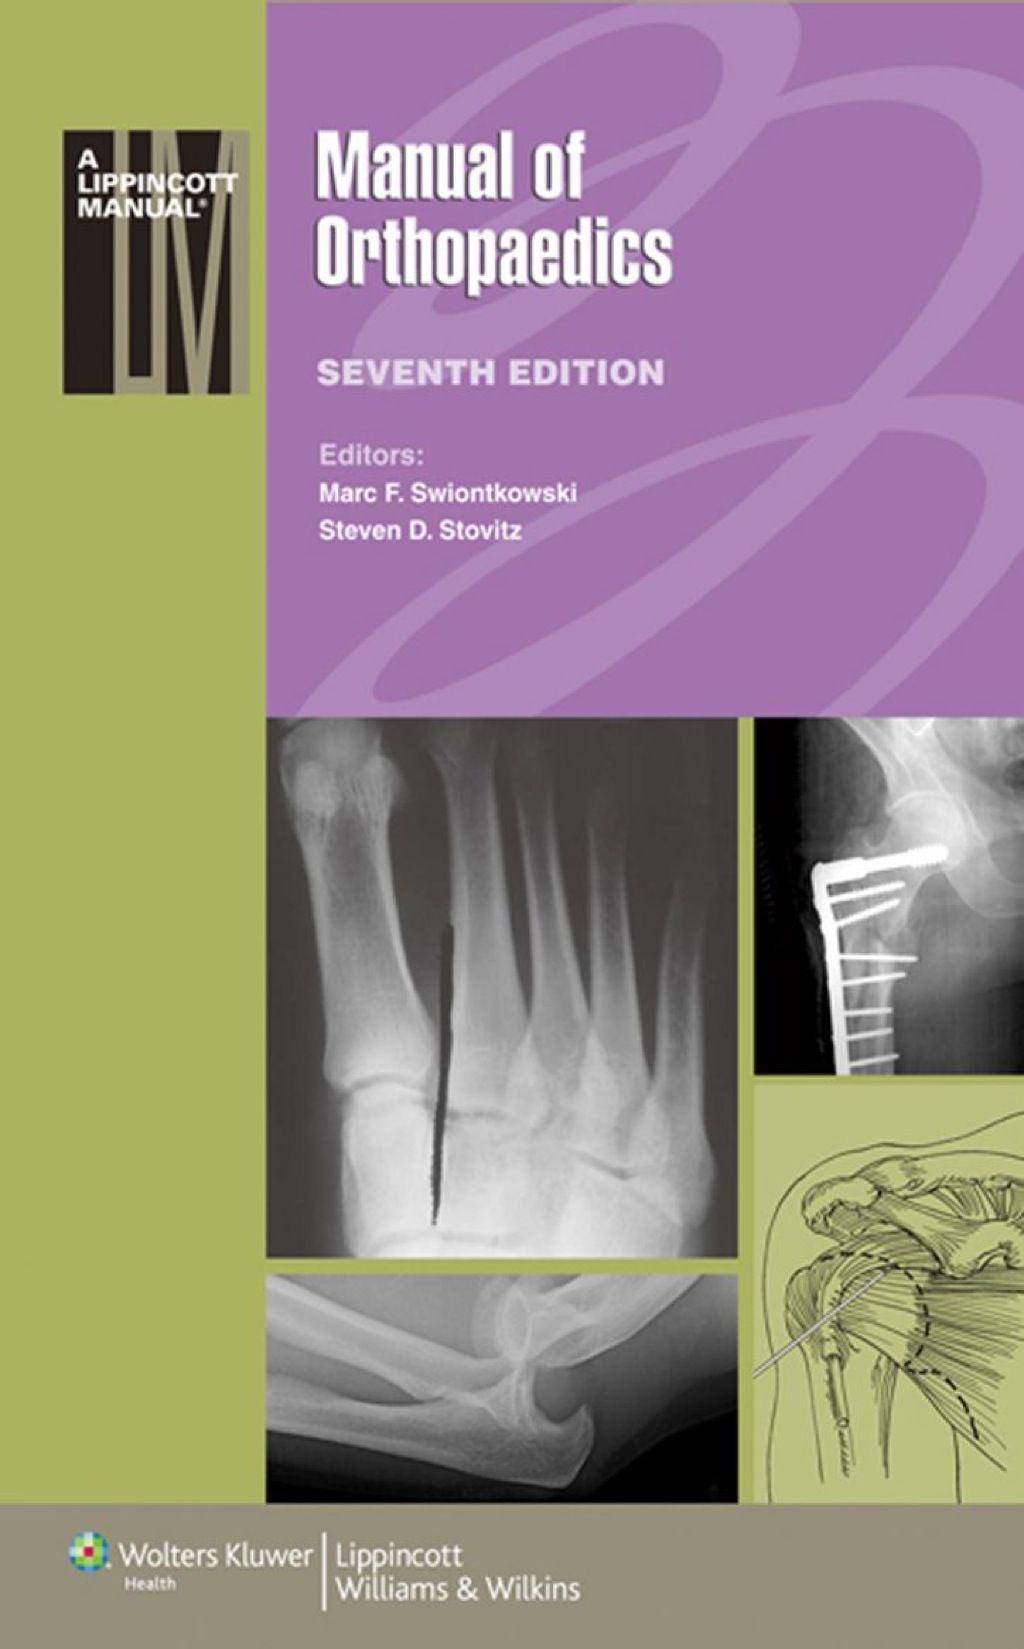 Manual of Orthopaedics (eBook Rental) Manual, Pdf, Ebooks